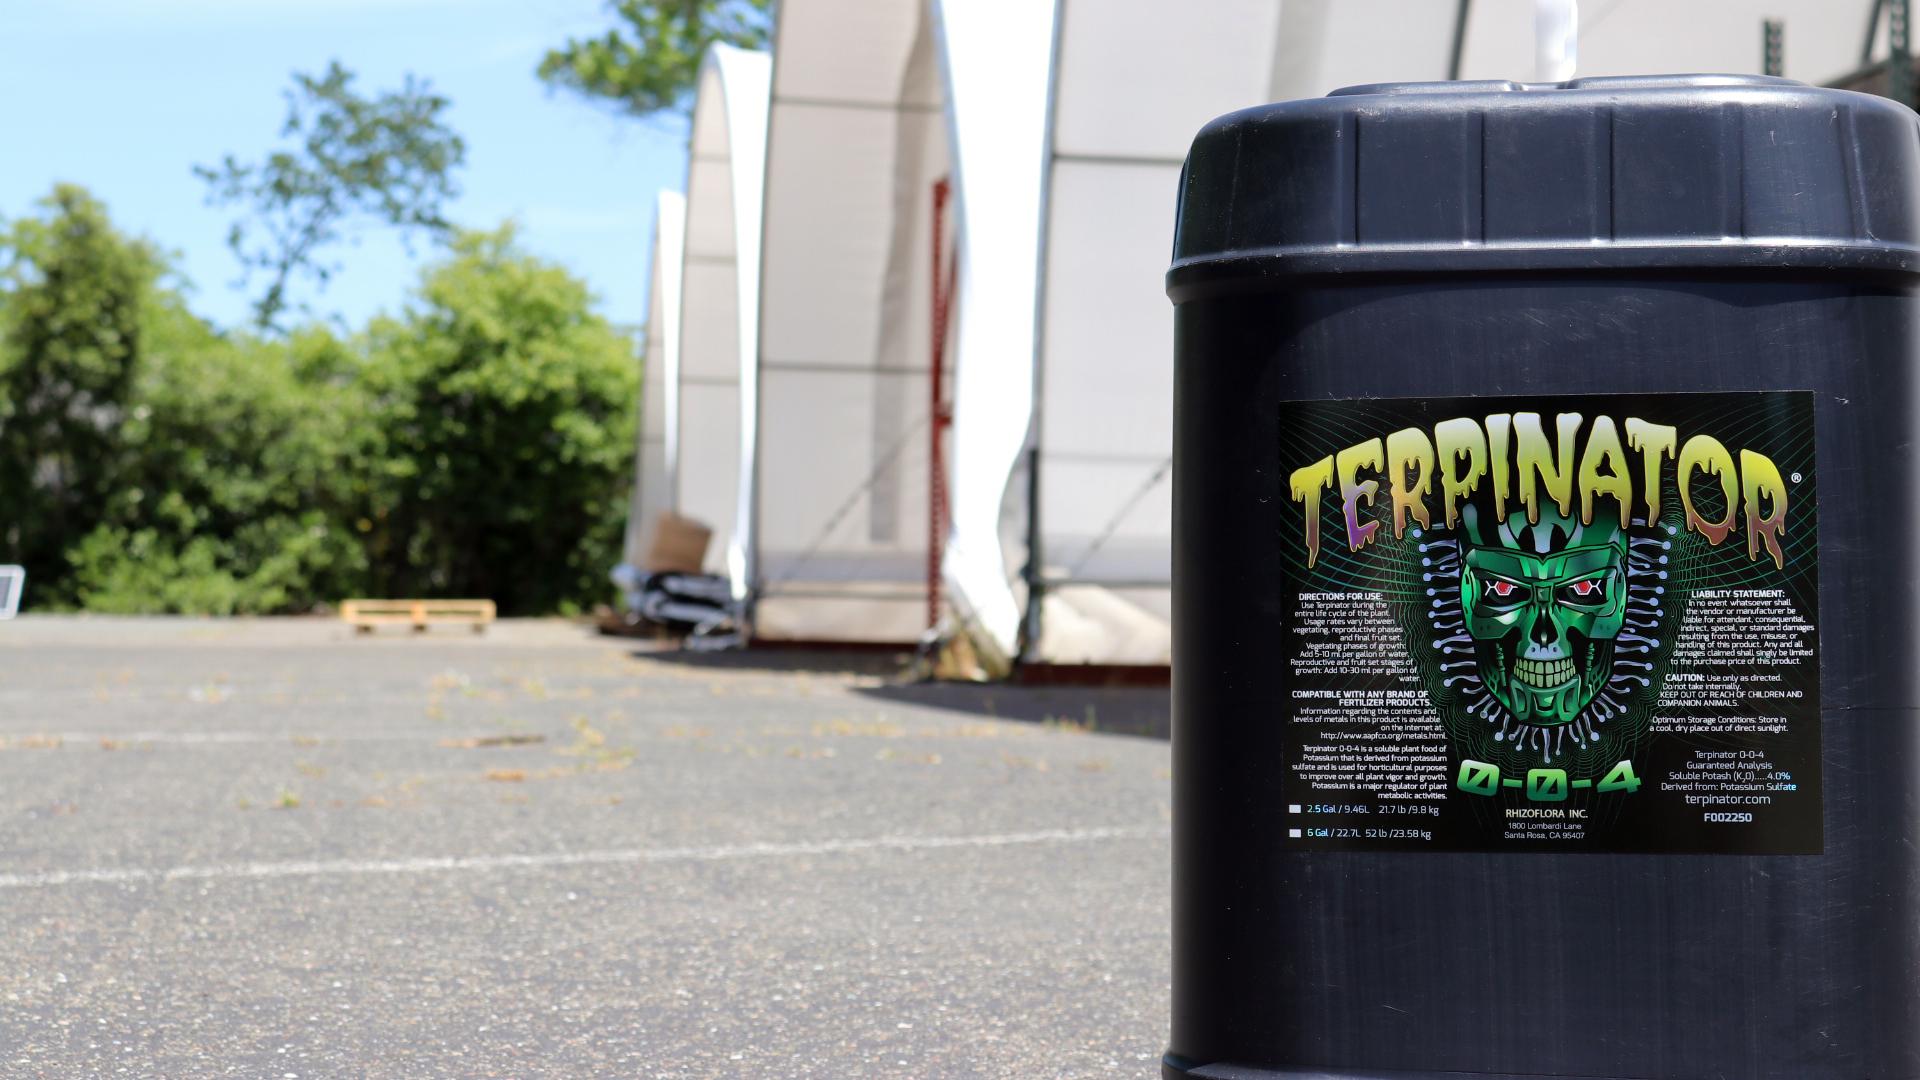 Terpinator The Original Source For Maximum Terpene Production